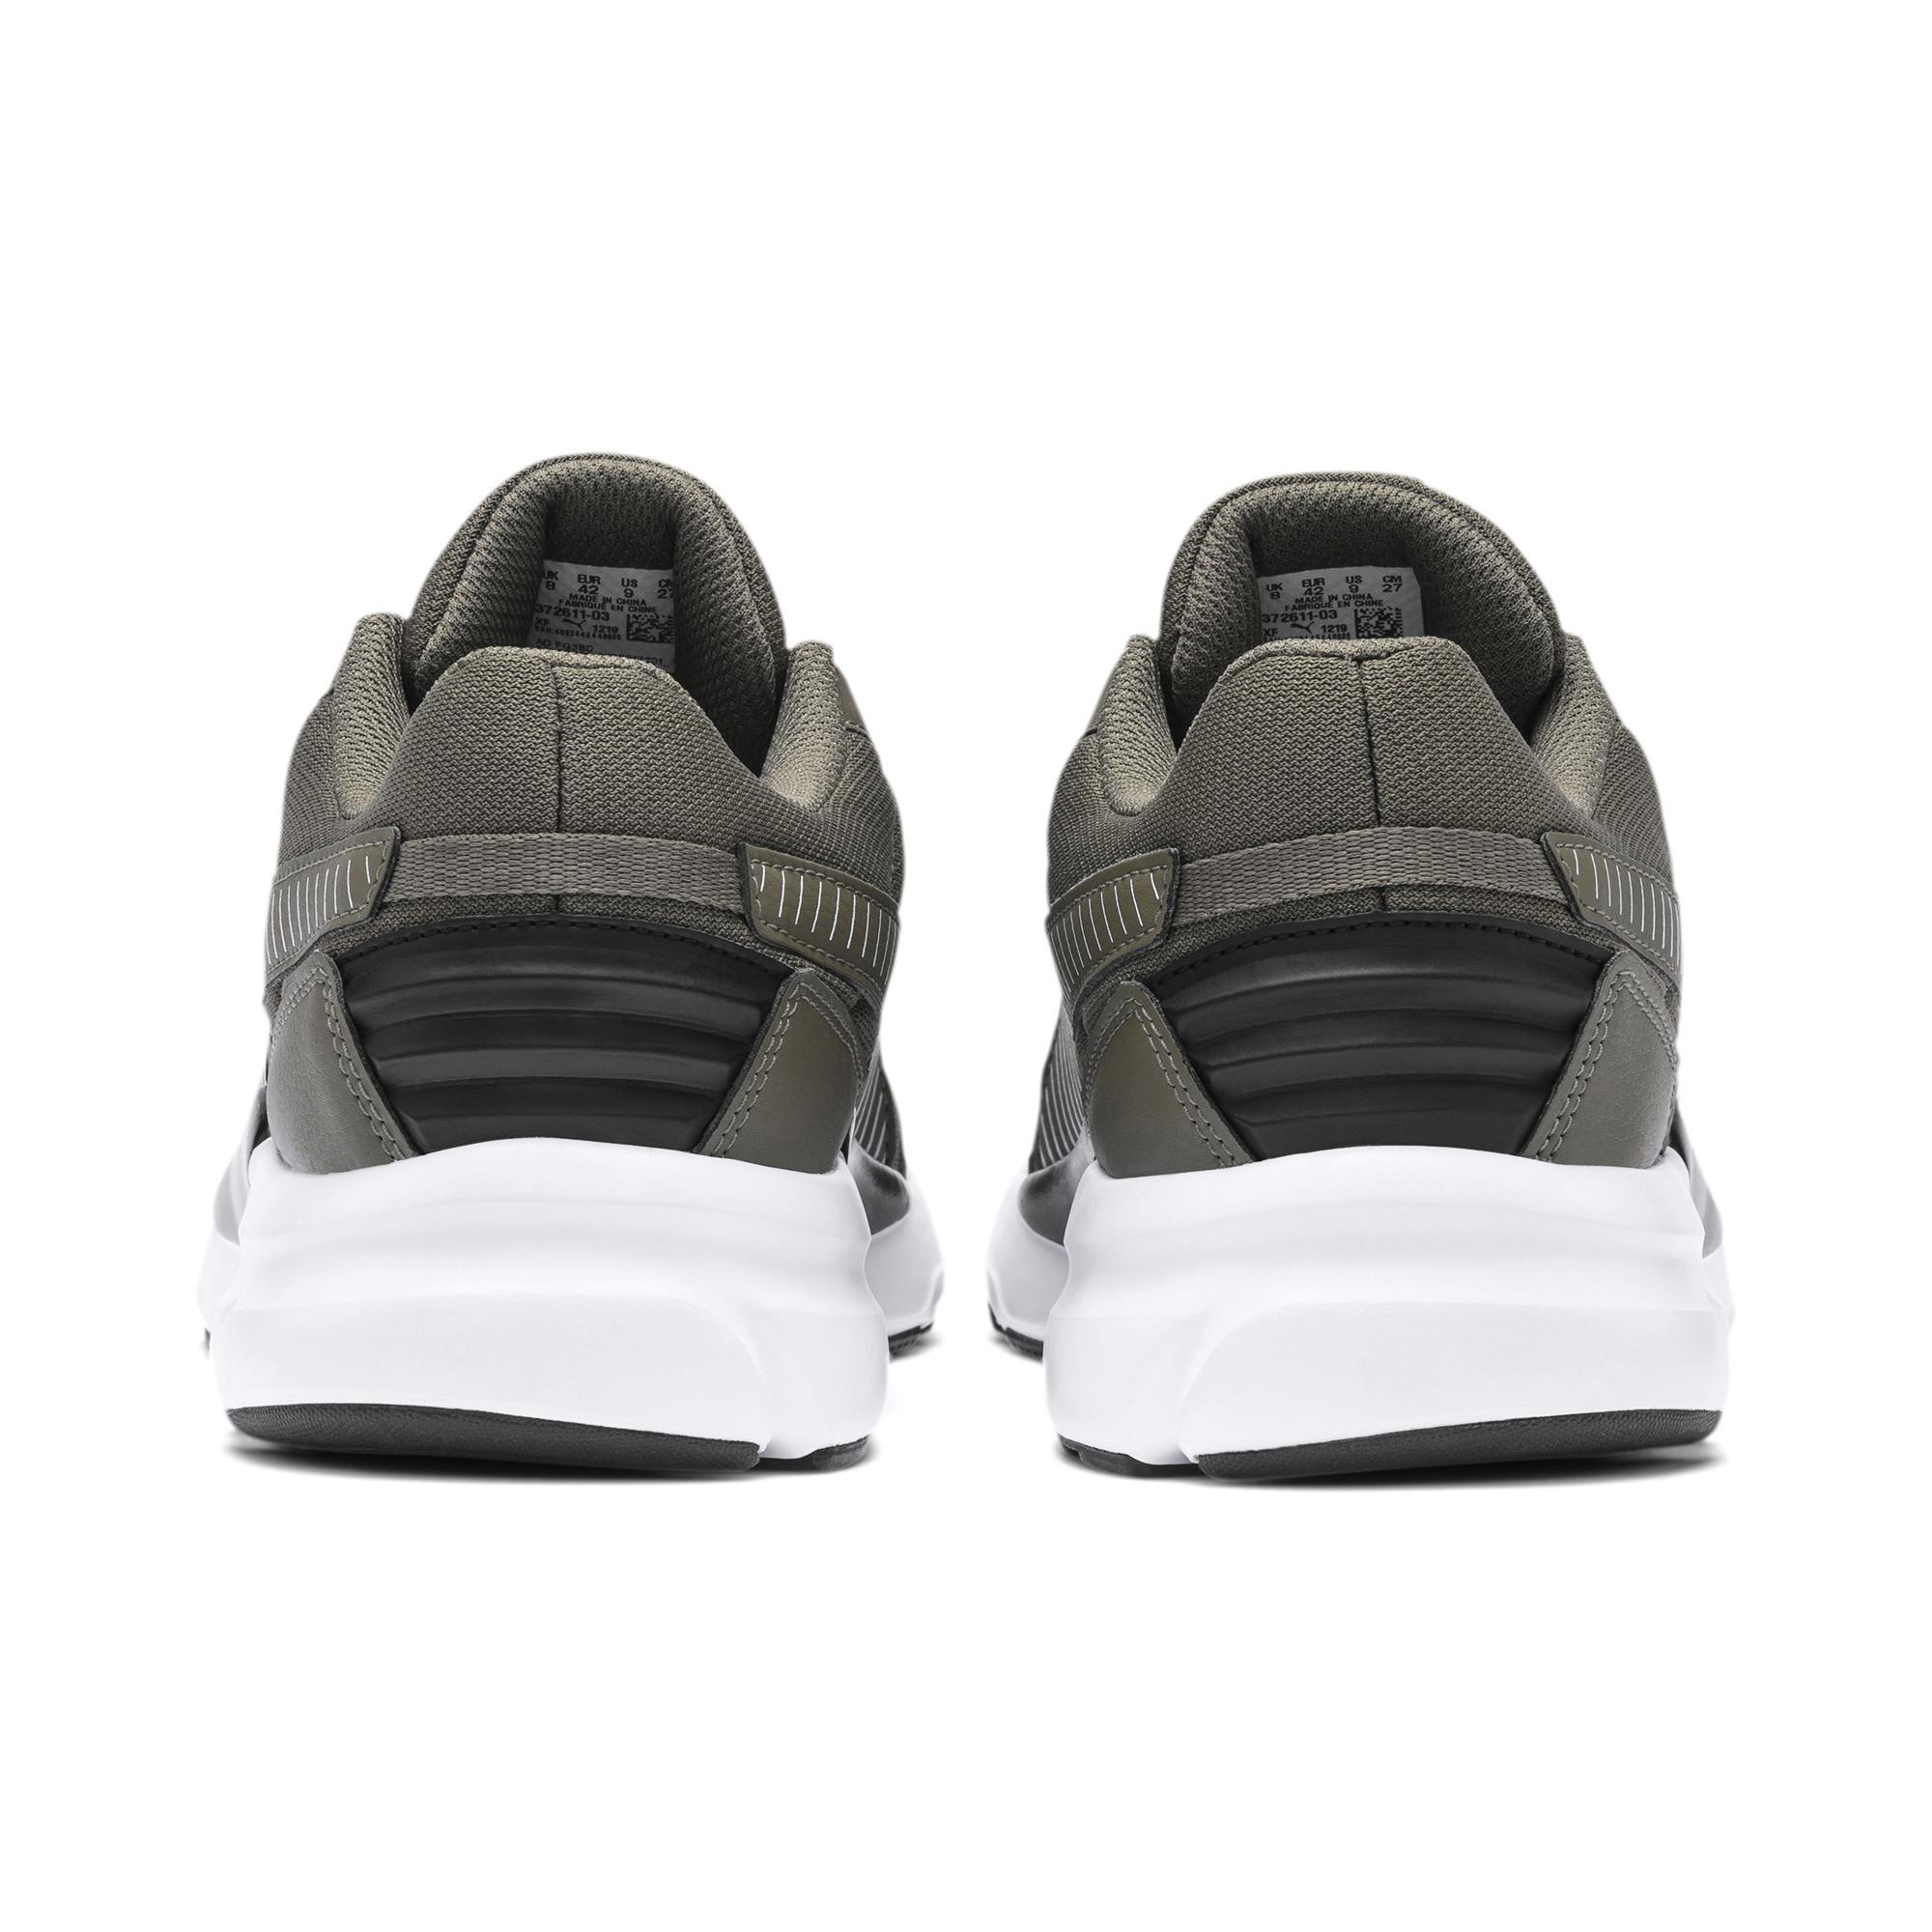 PUMA-Future-Runner-SL-Sneaker-Unisex-Schuhe-Basics-Neu Indexbild 3